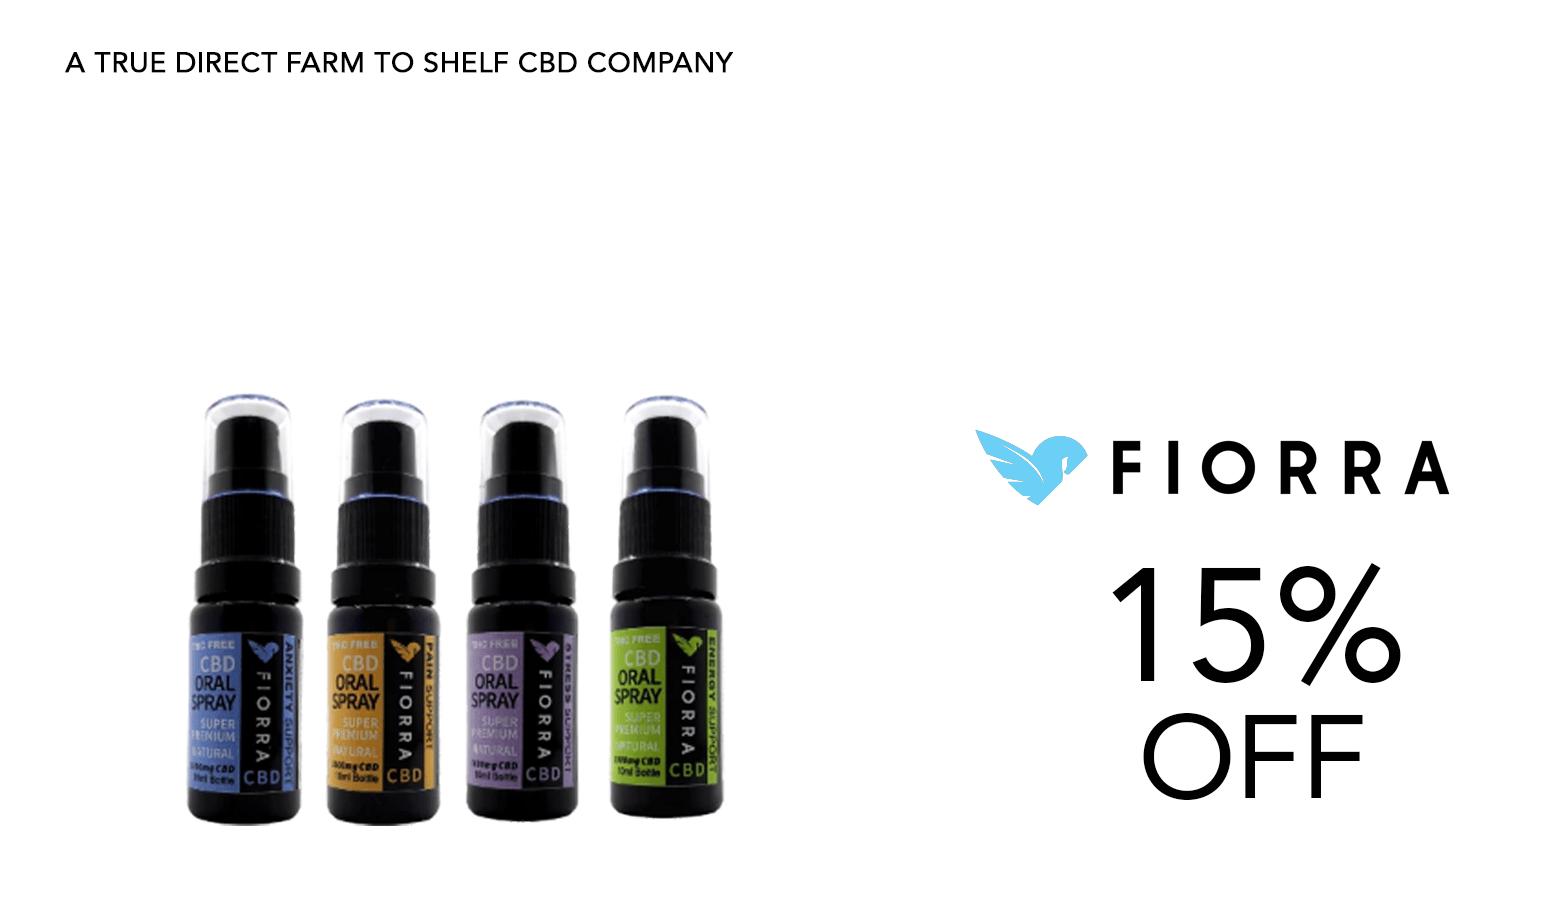 Fiorra CBD Coupon Code Oil Spray Offer Website